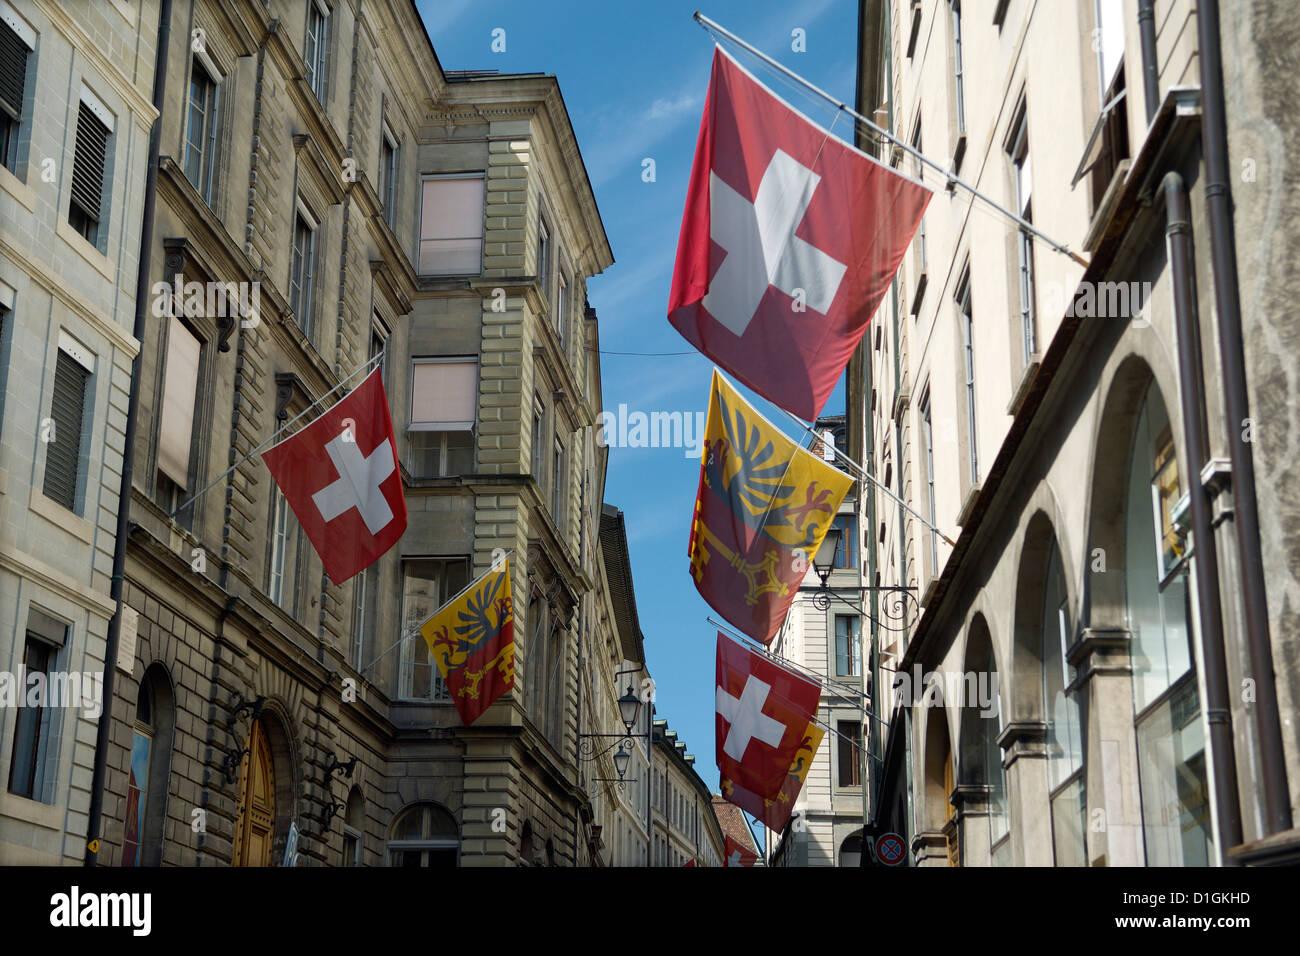 Street scenes in Geneva old Town, Geneva, Switzerland, Europe - Stock Image